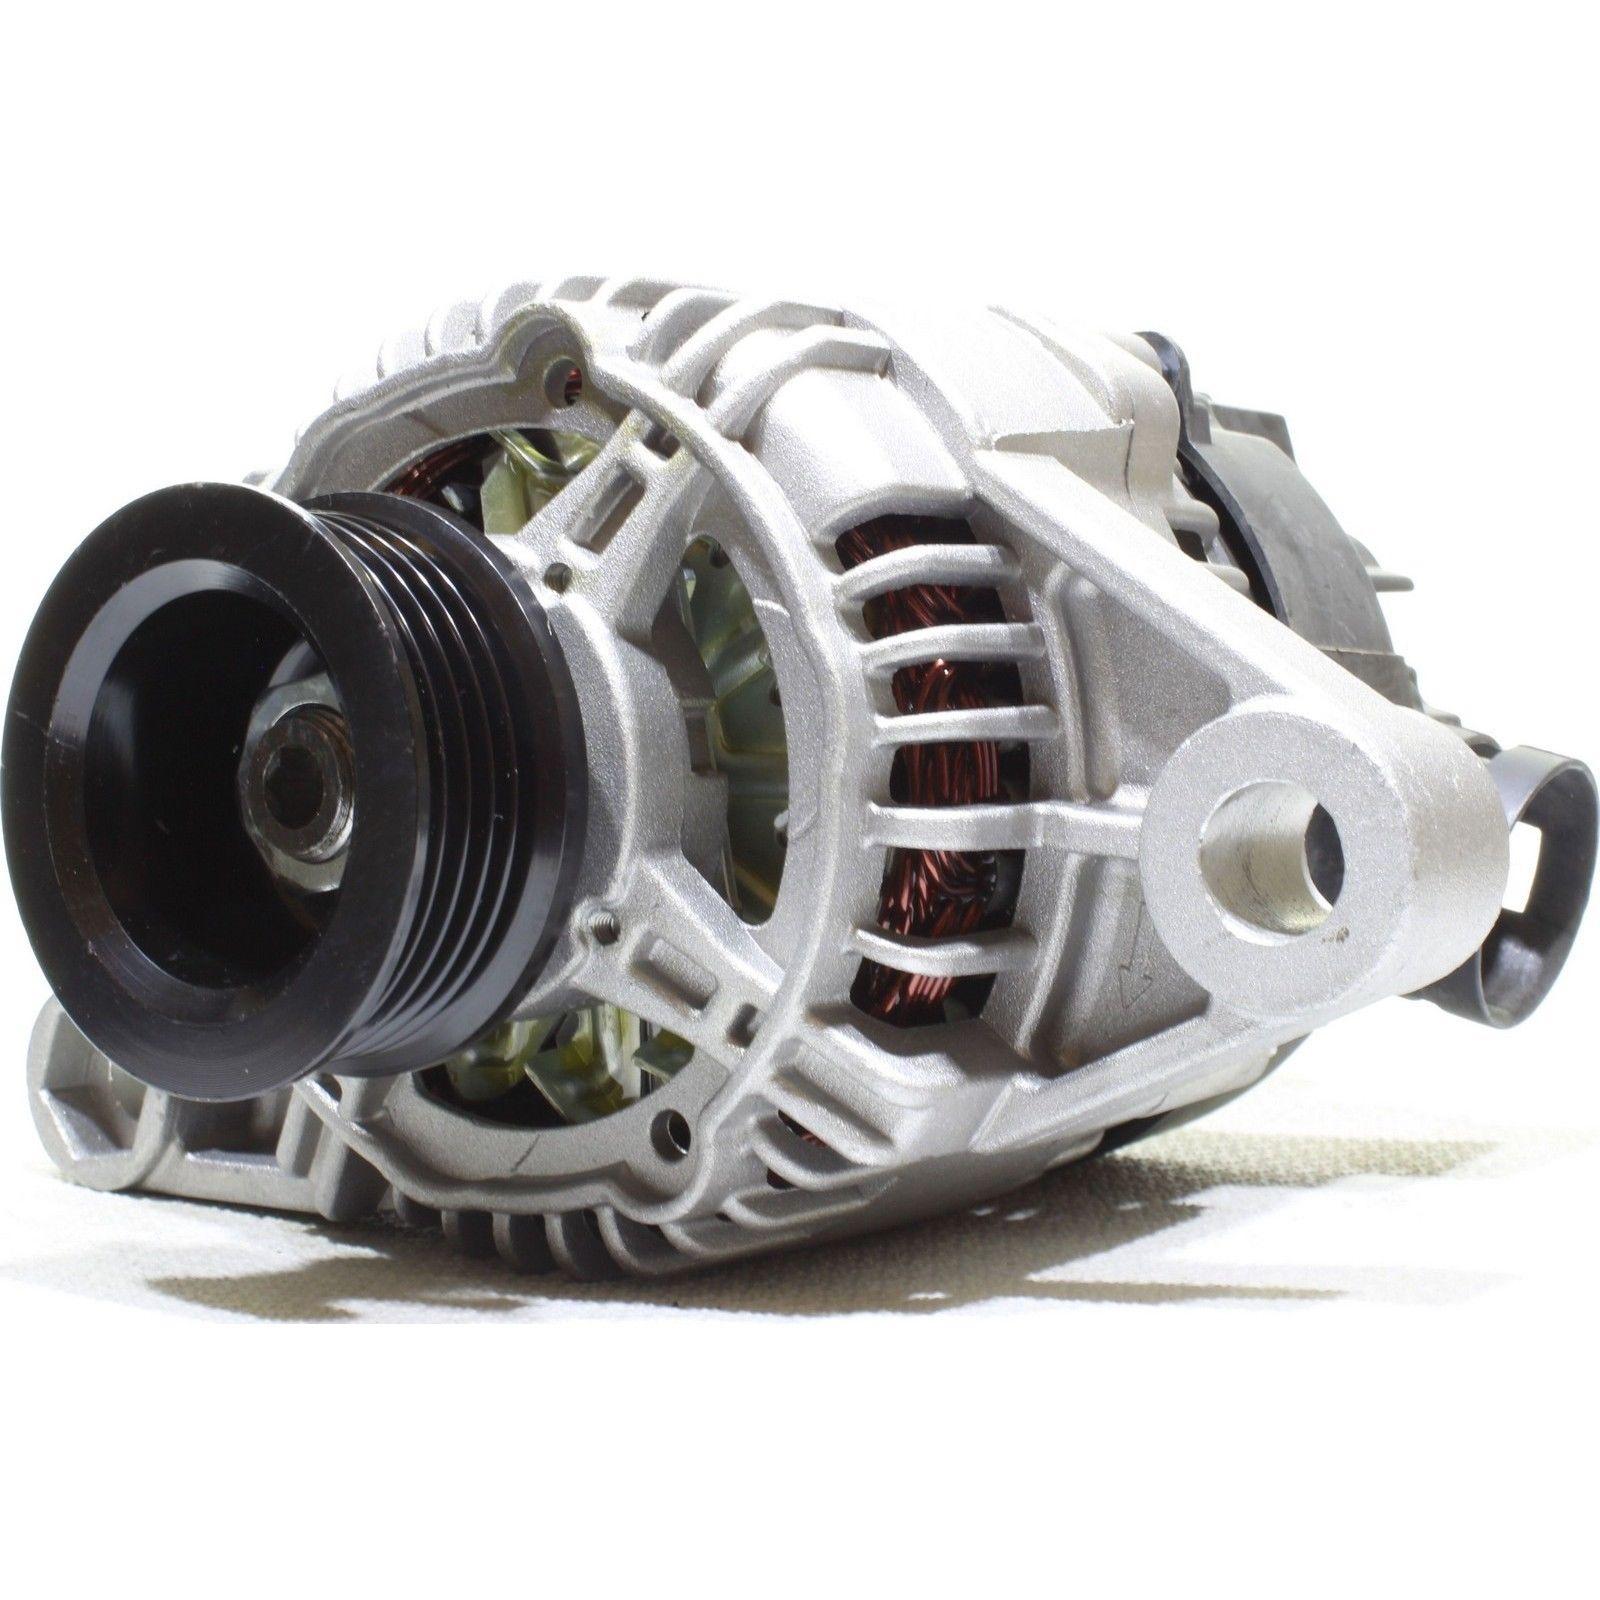 Fiat Bravo Brava Electrical Circuit And Wiring Harness